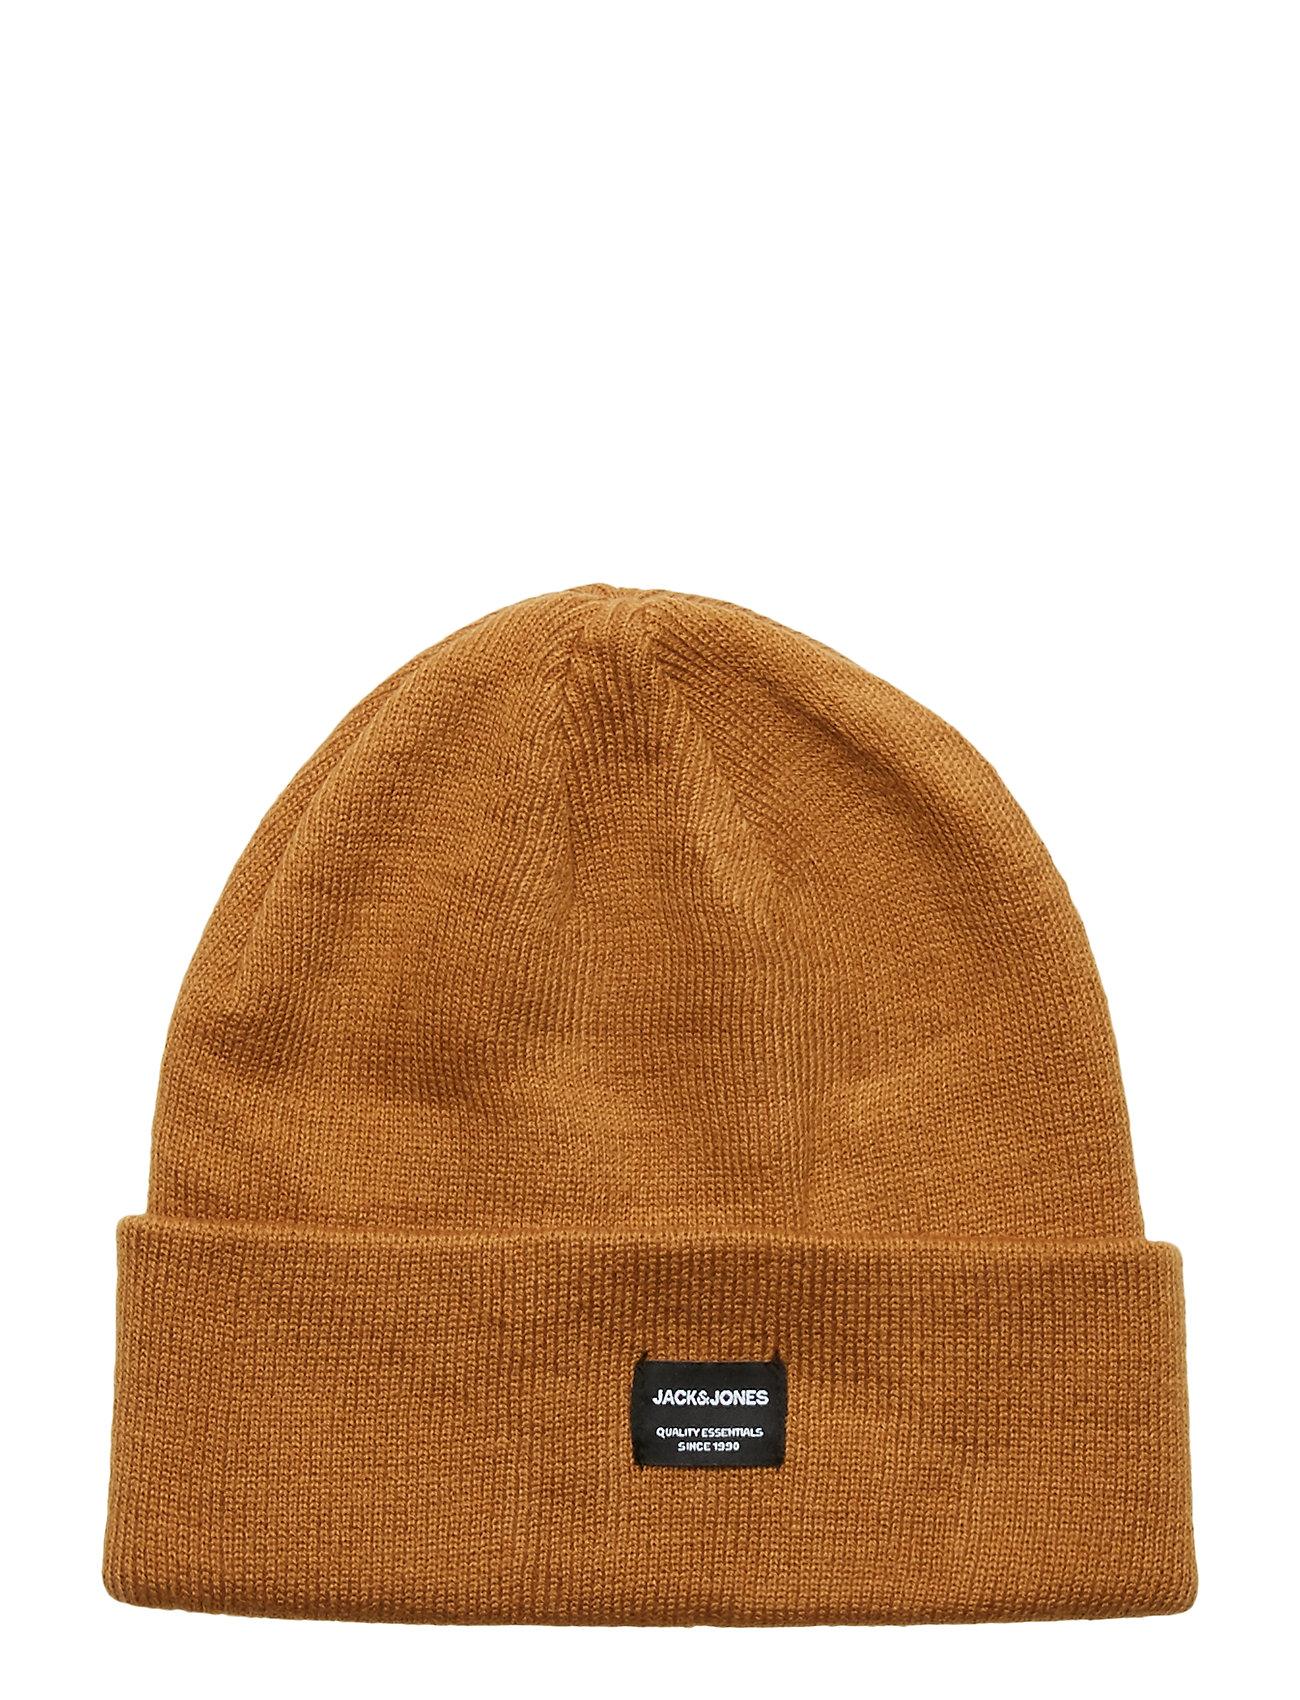 Image of Jacdna Beanie Noos Accessories Hats & Caps Beanies Brun Jack & J S (3213733551)